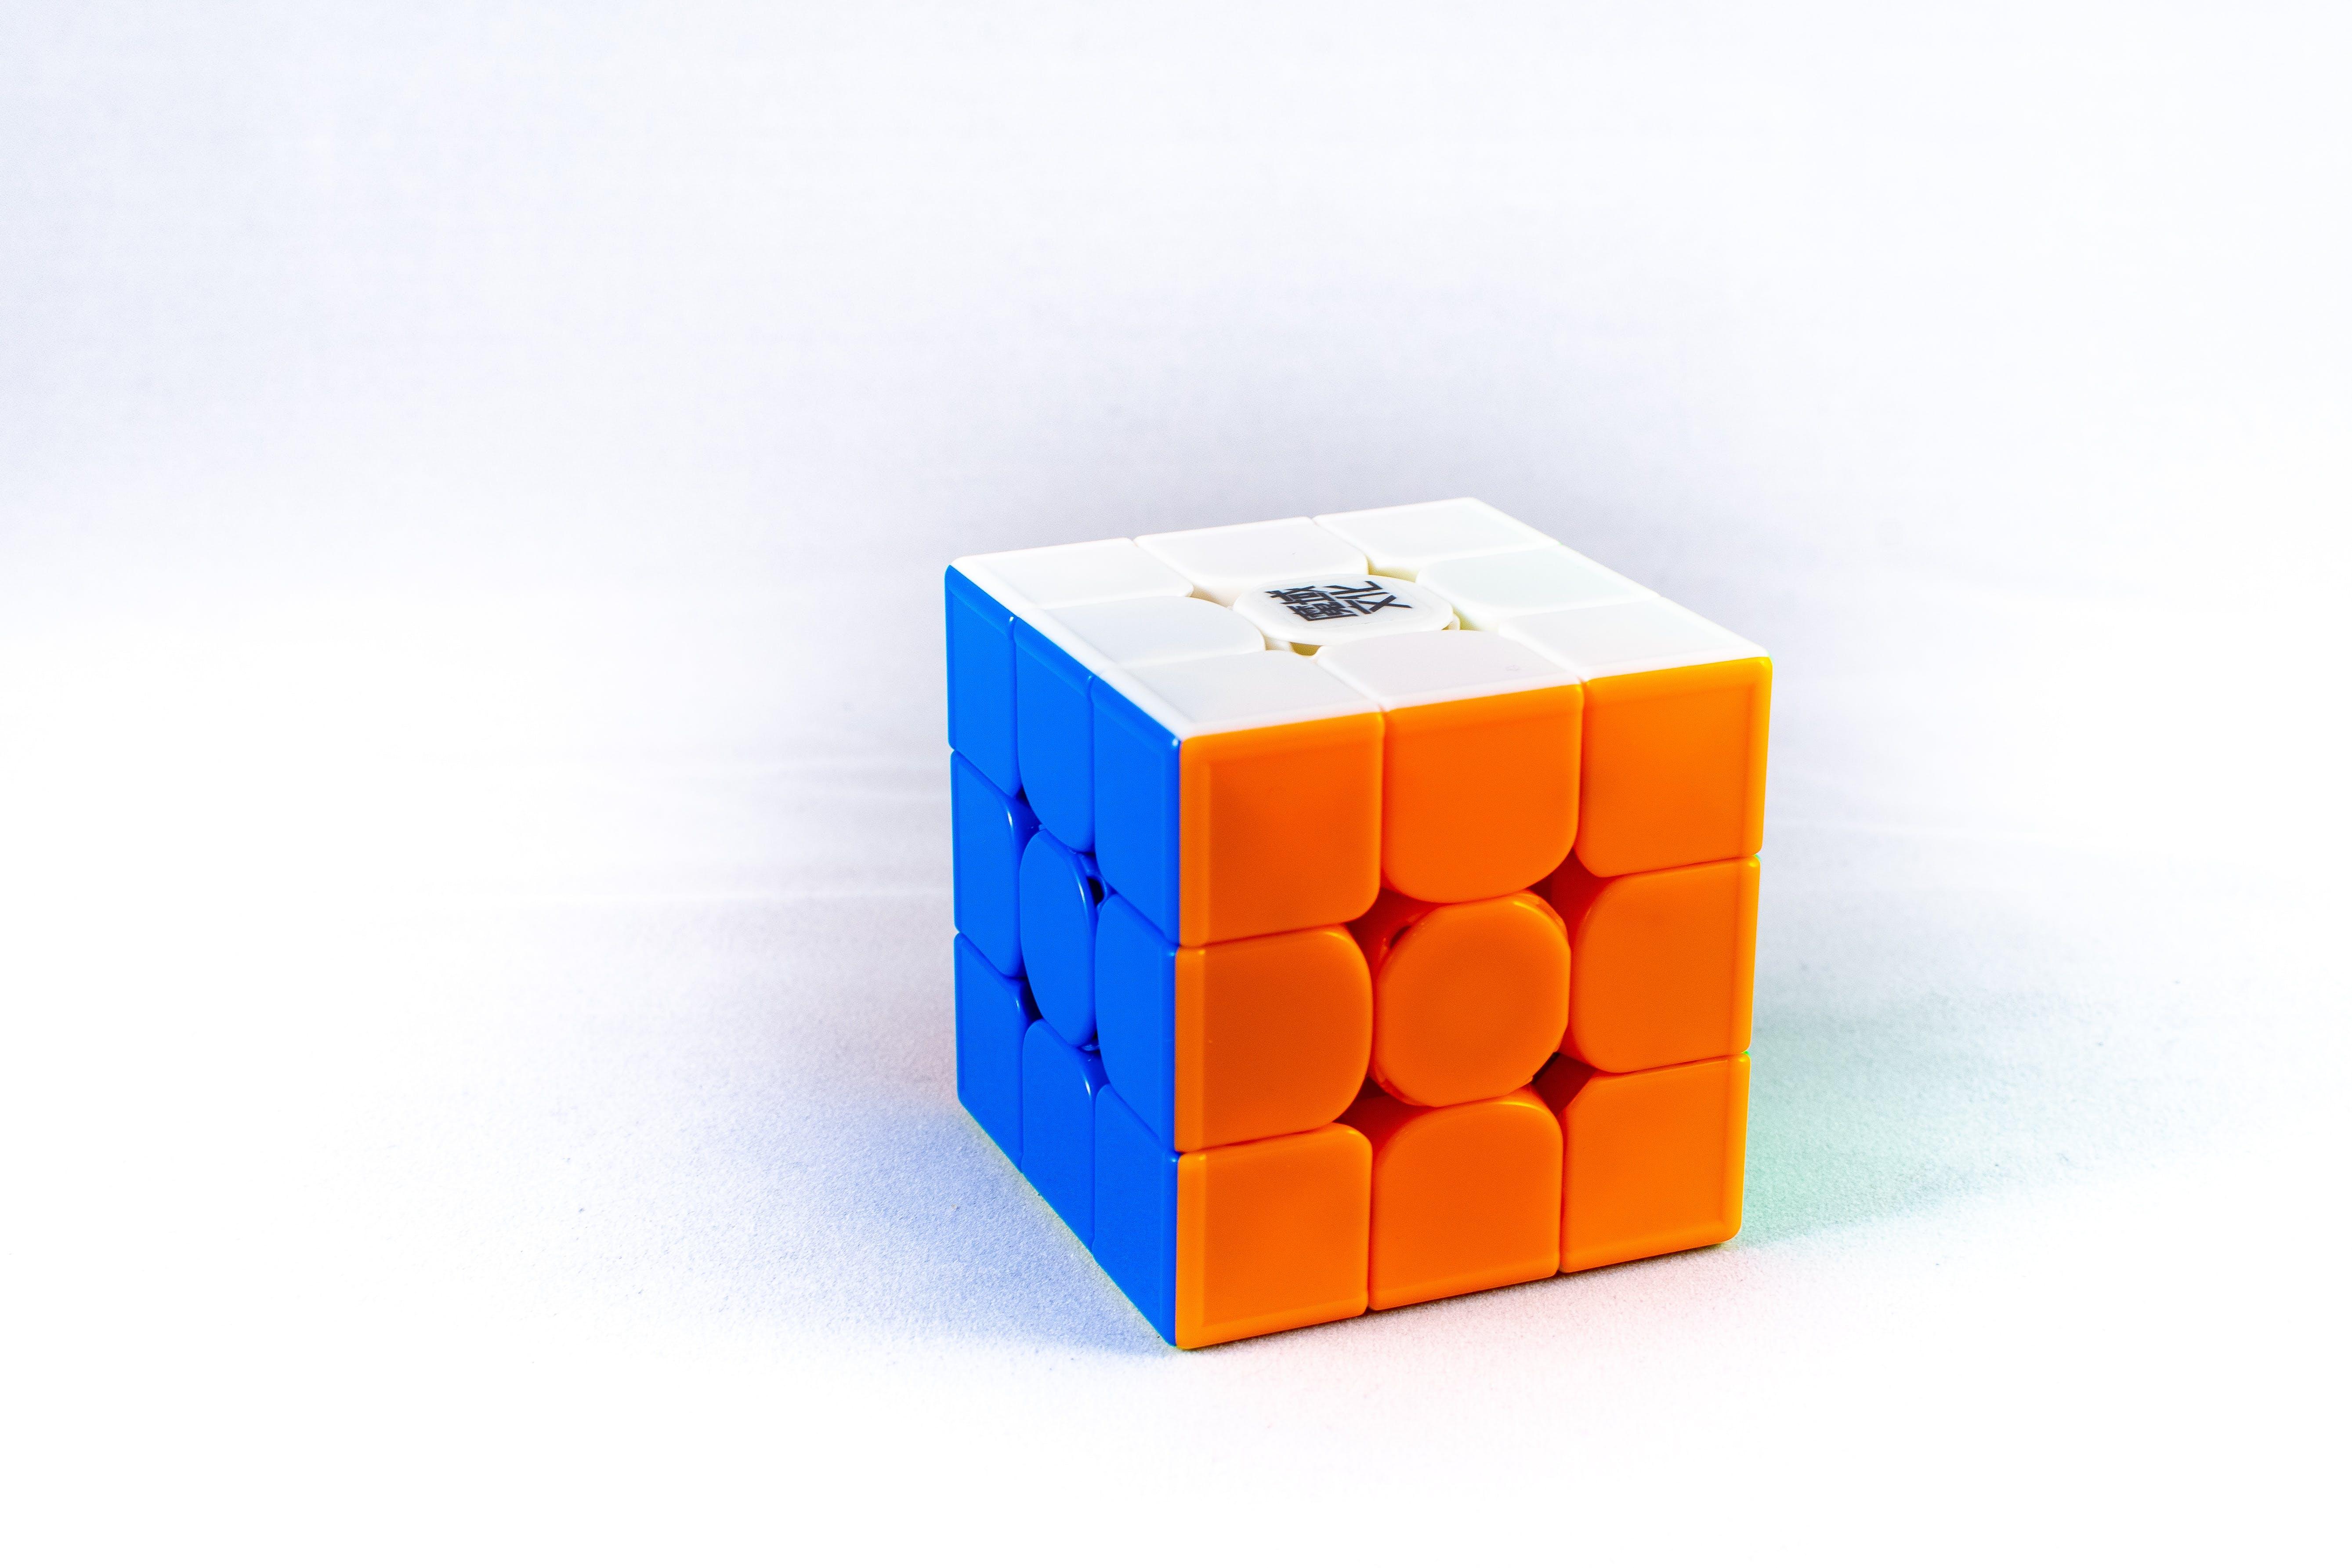 3 X 3 Magic Cube